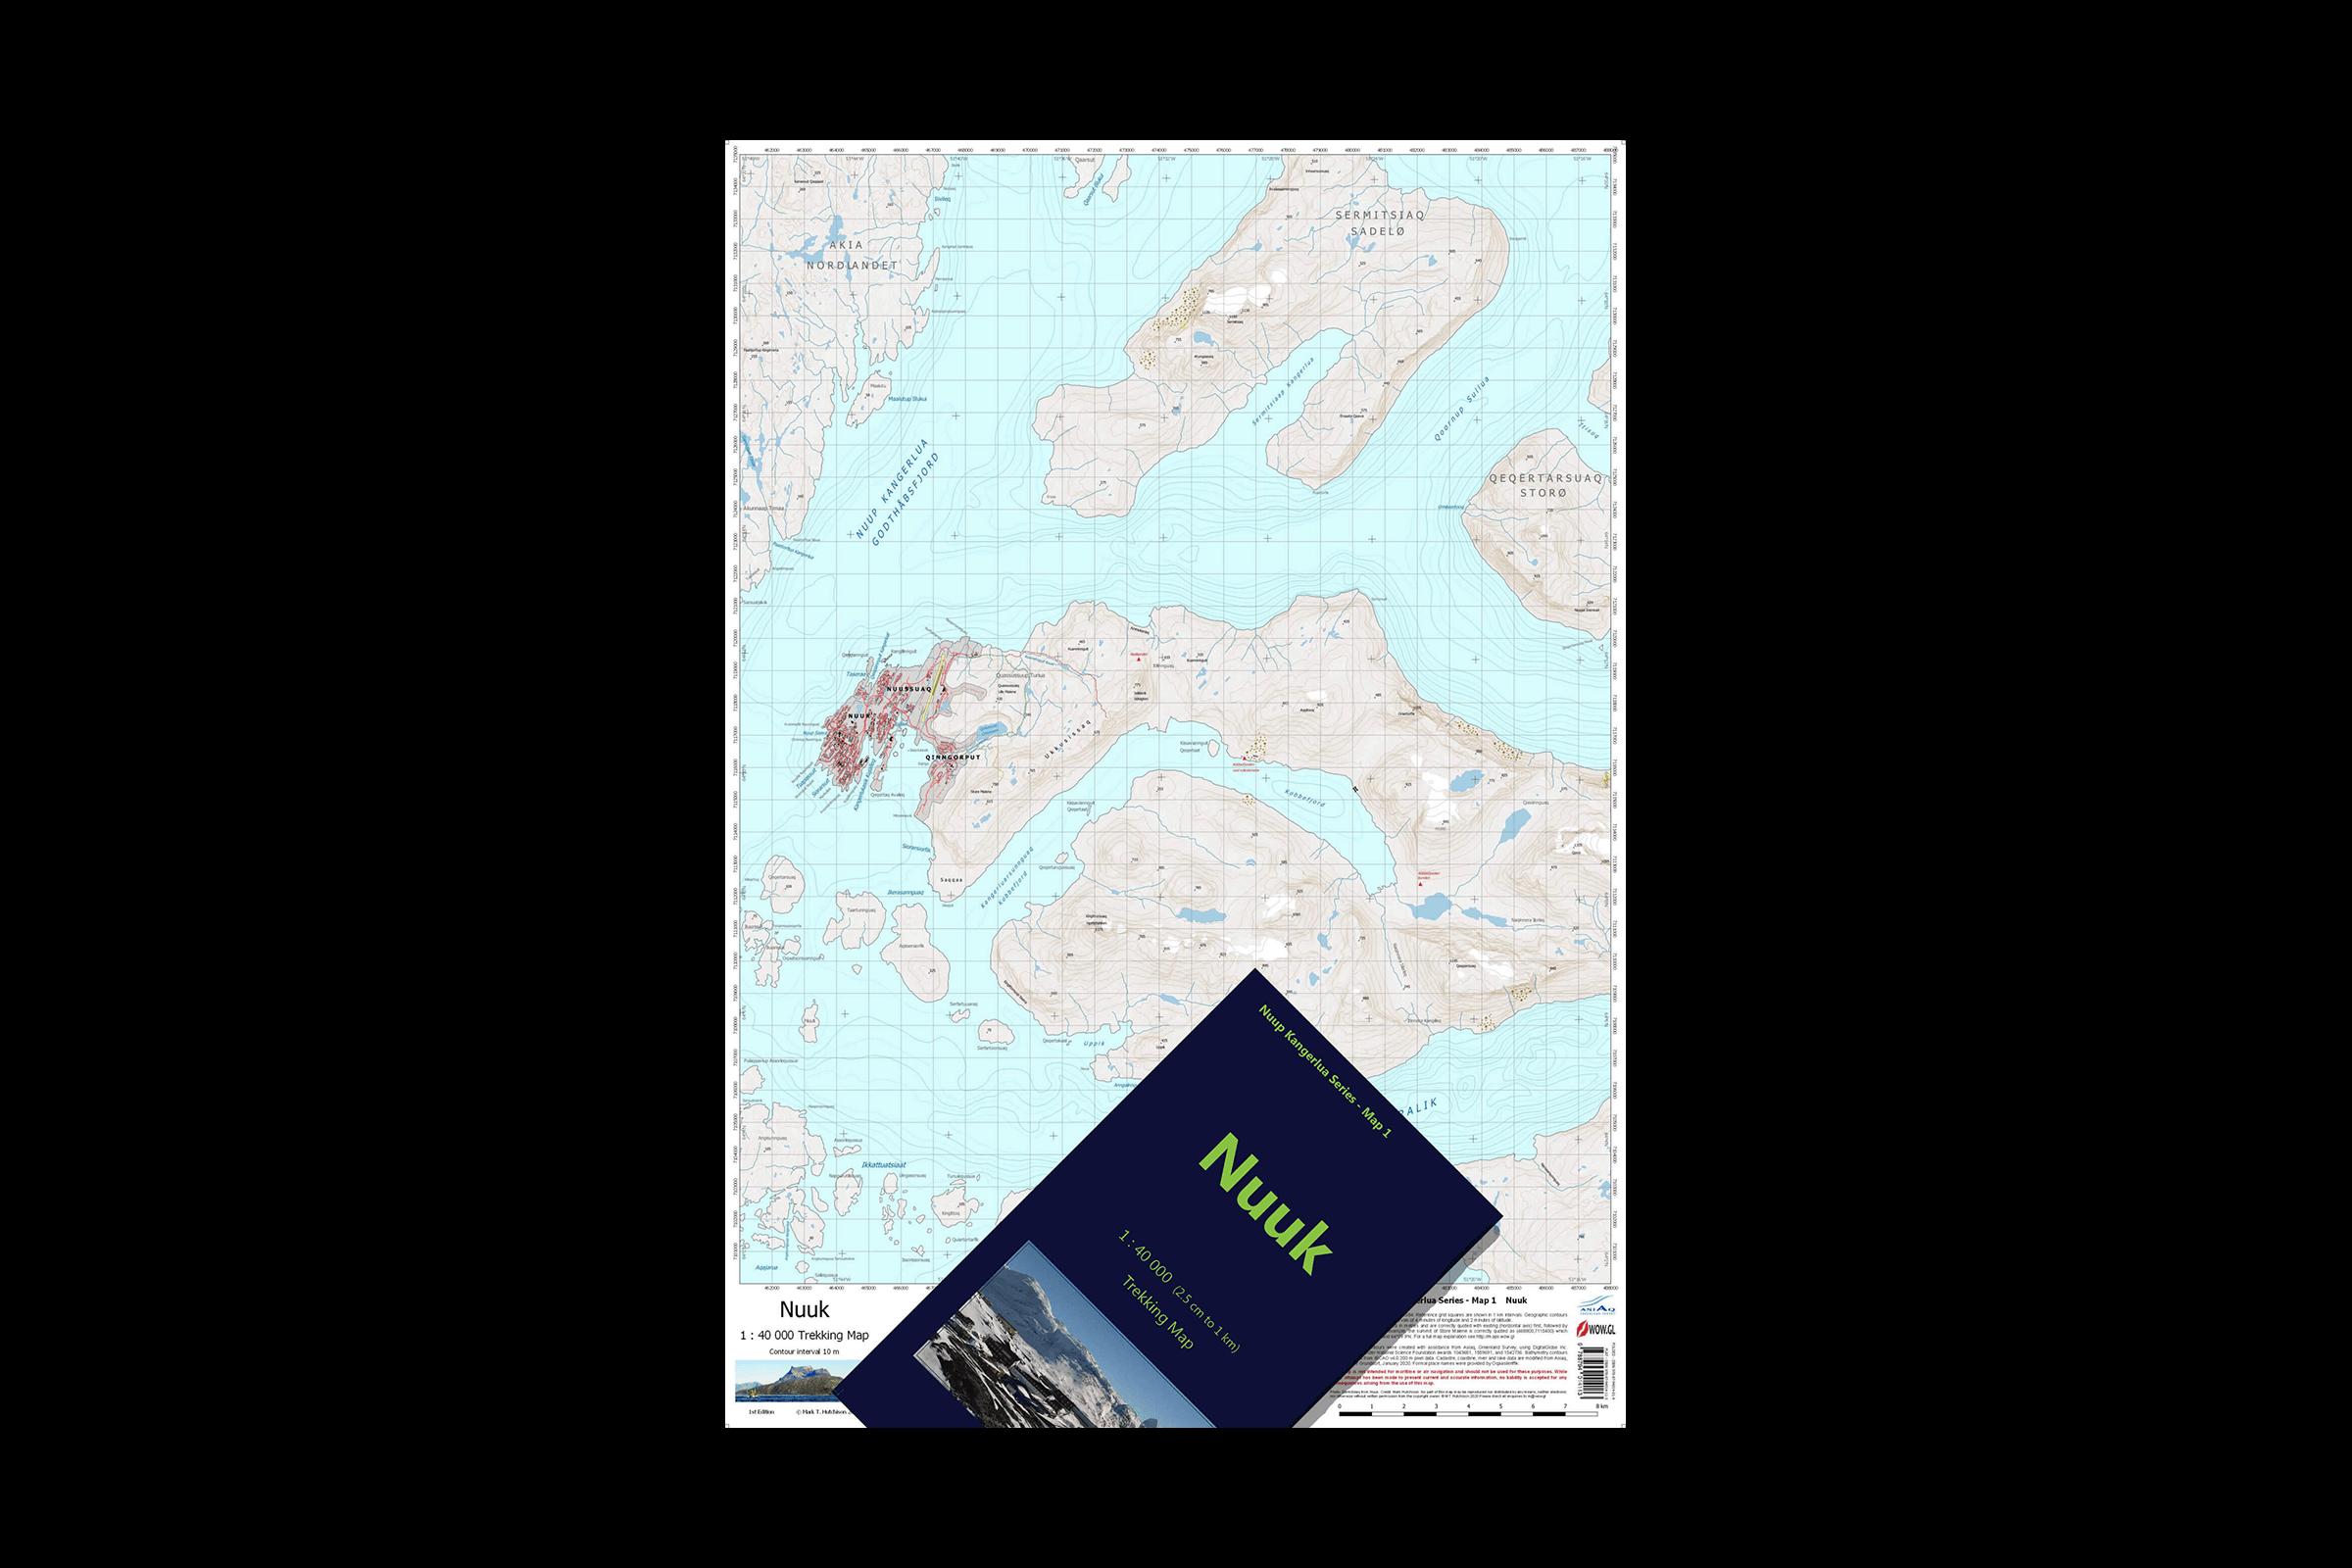 Nuup Kngerlua Hiking Map Series